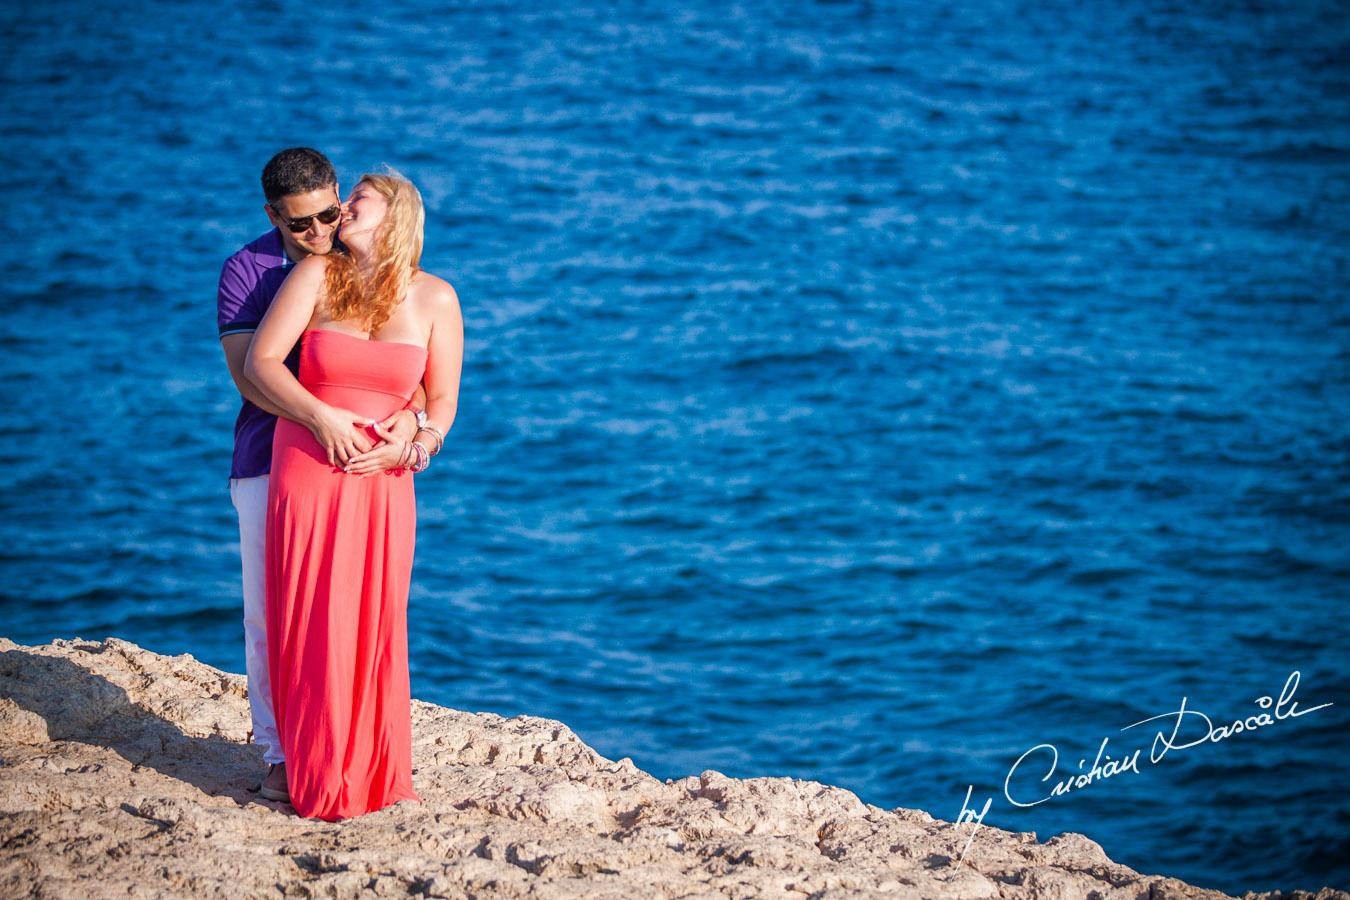 Photo shoot in Cyprus, Agya Napa - Demetris & Anna. Cyprus Photographer: Cristian Dascalu